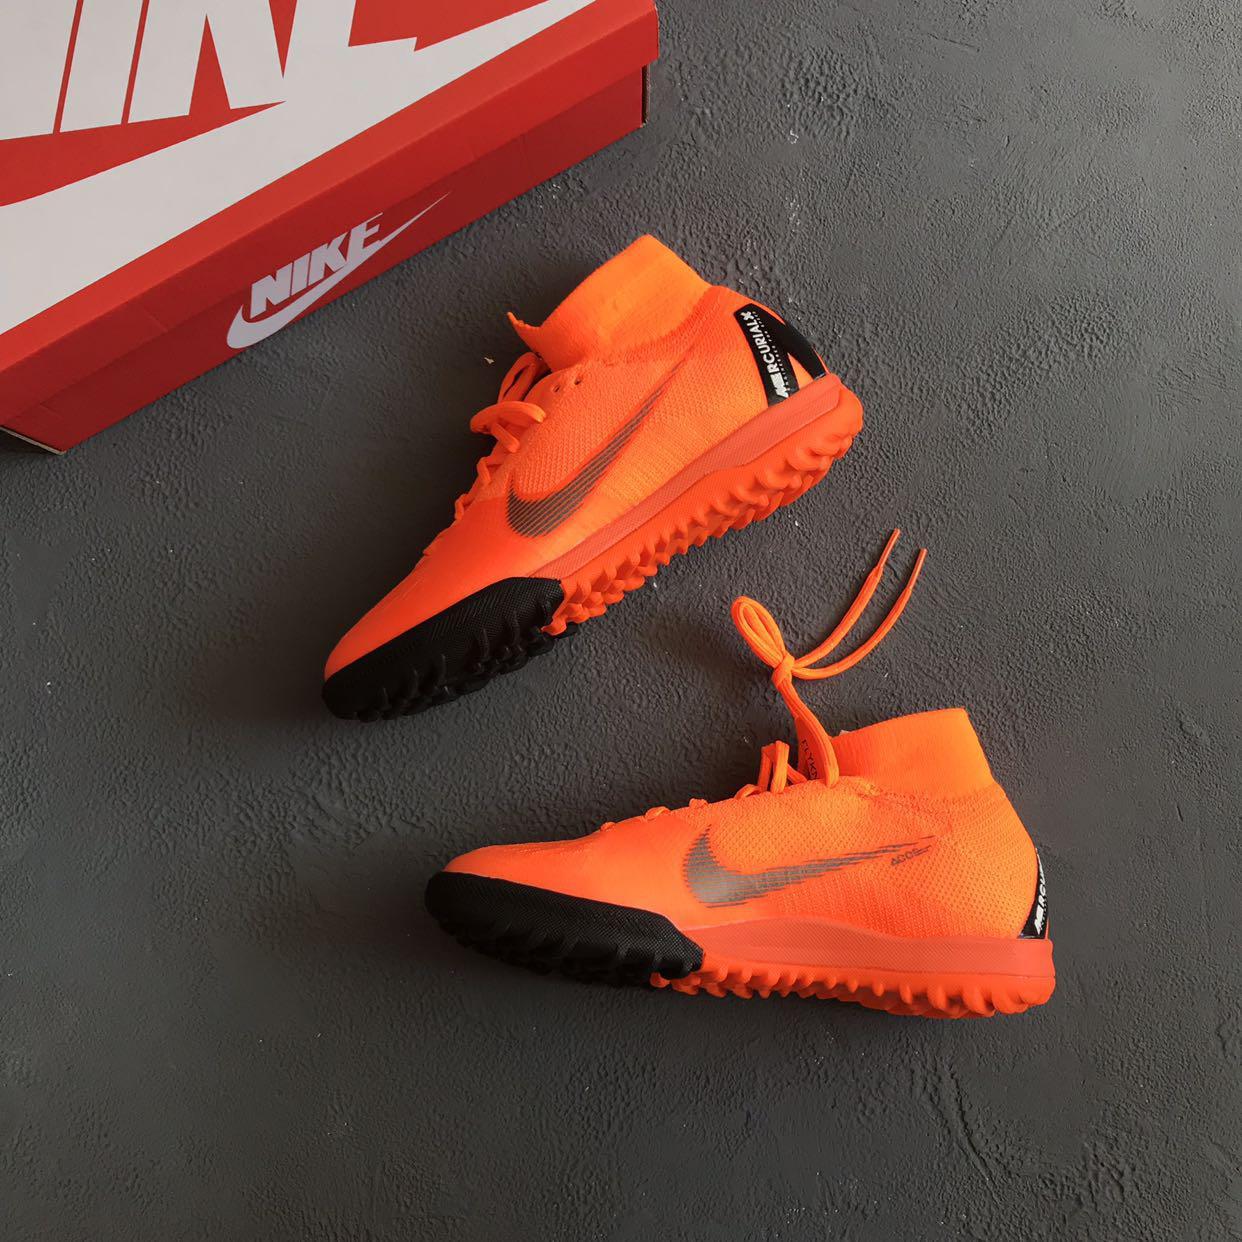 52f5e0e0 Купить Сороконожки Nike Mercurial 360 в Киеве от